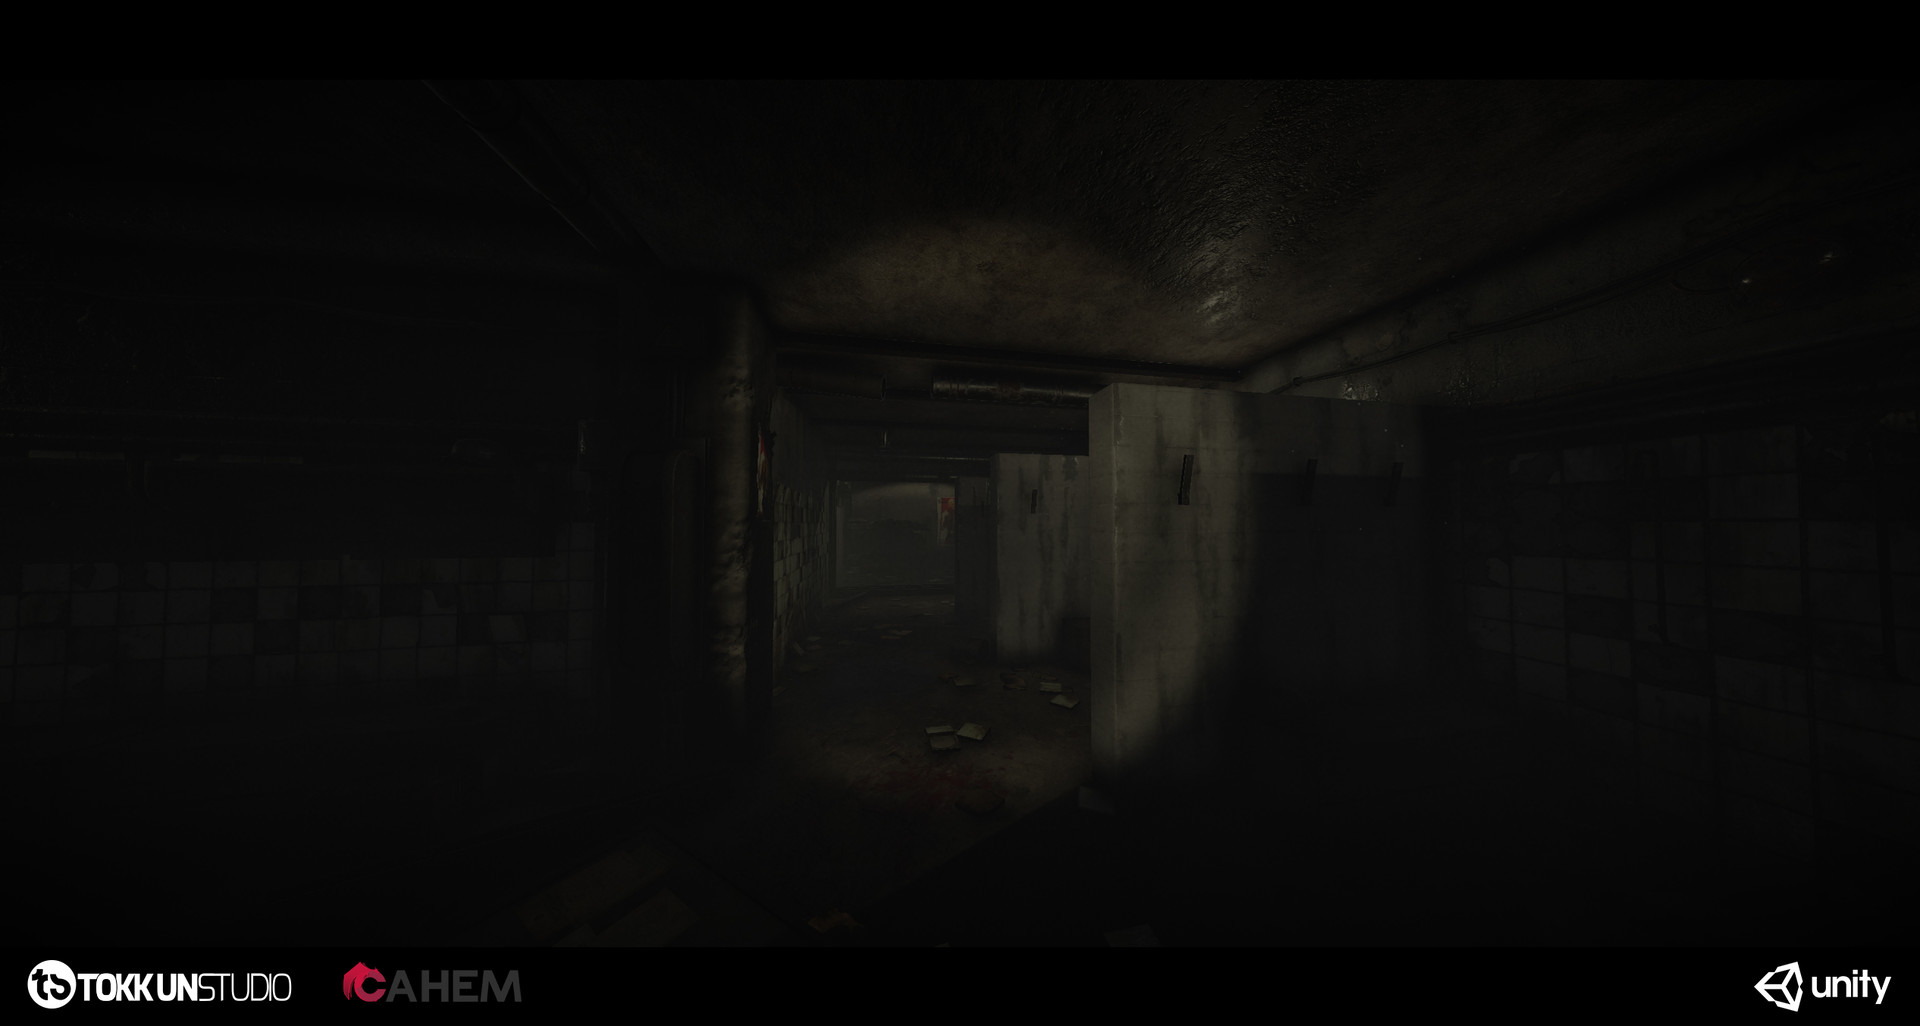 Tokkun studio bunker shot 31